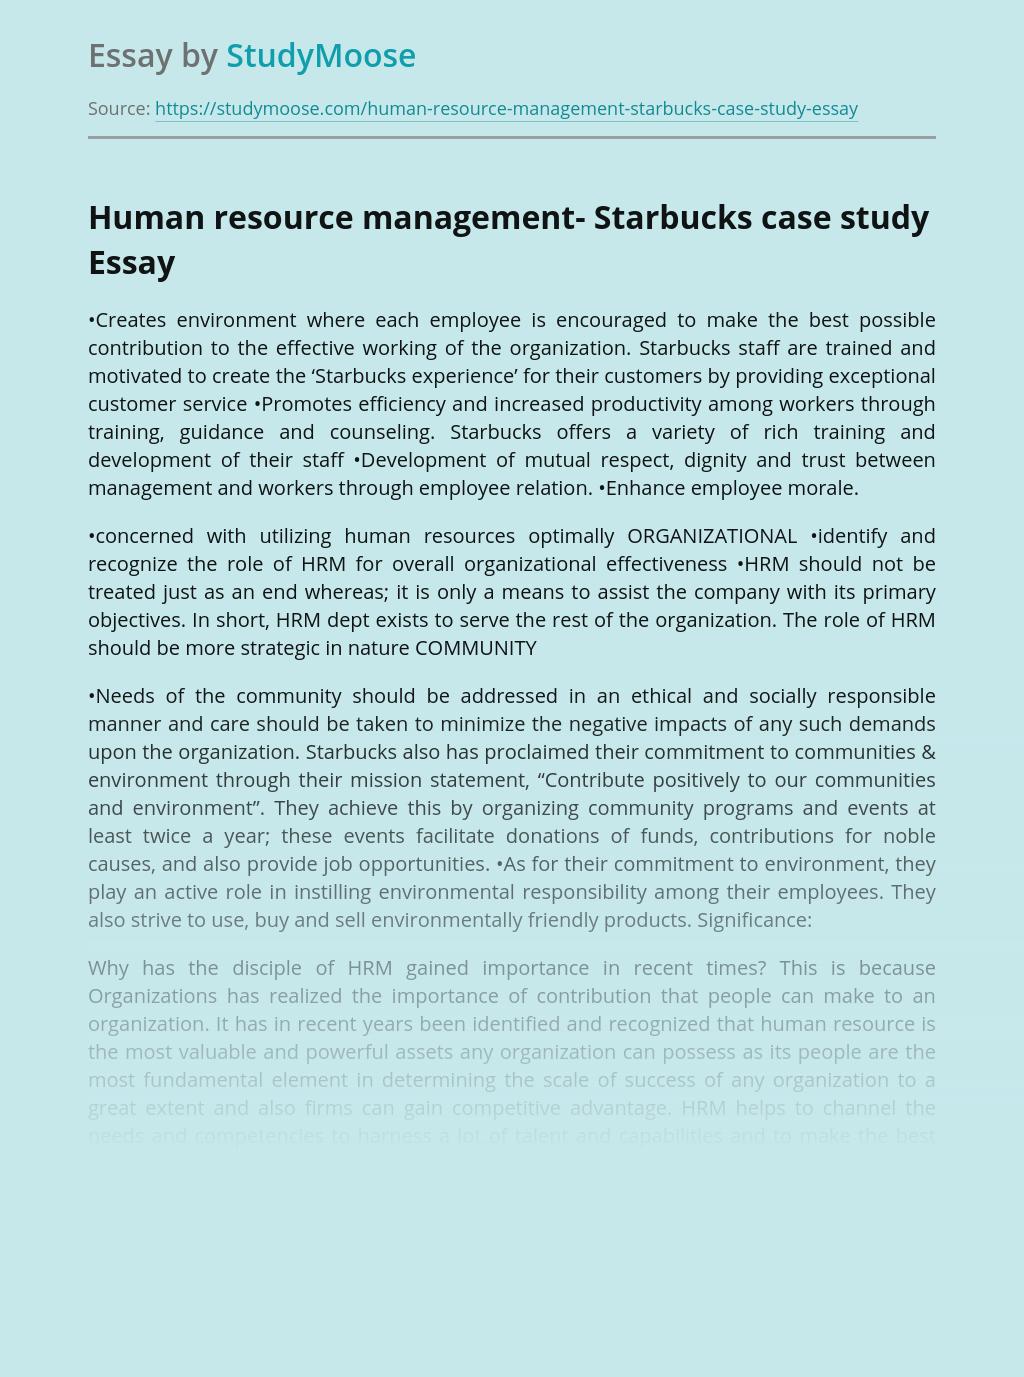 Human resource management- Starbucks case study